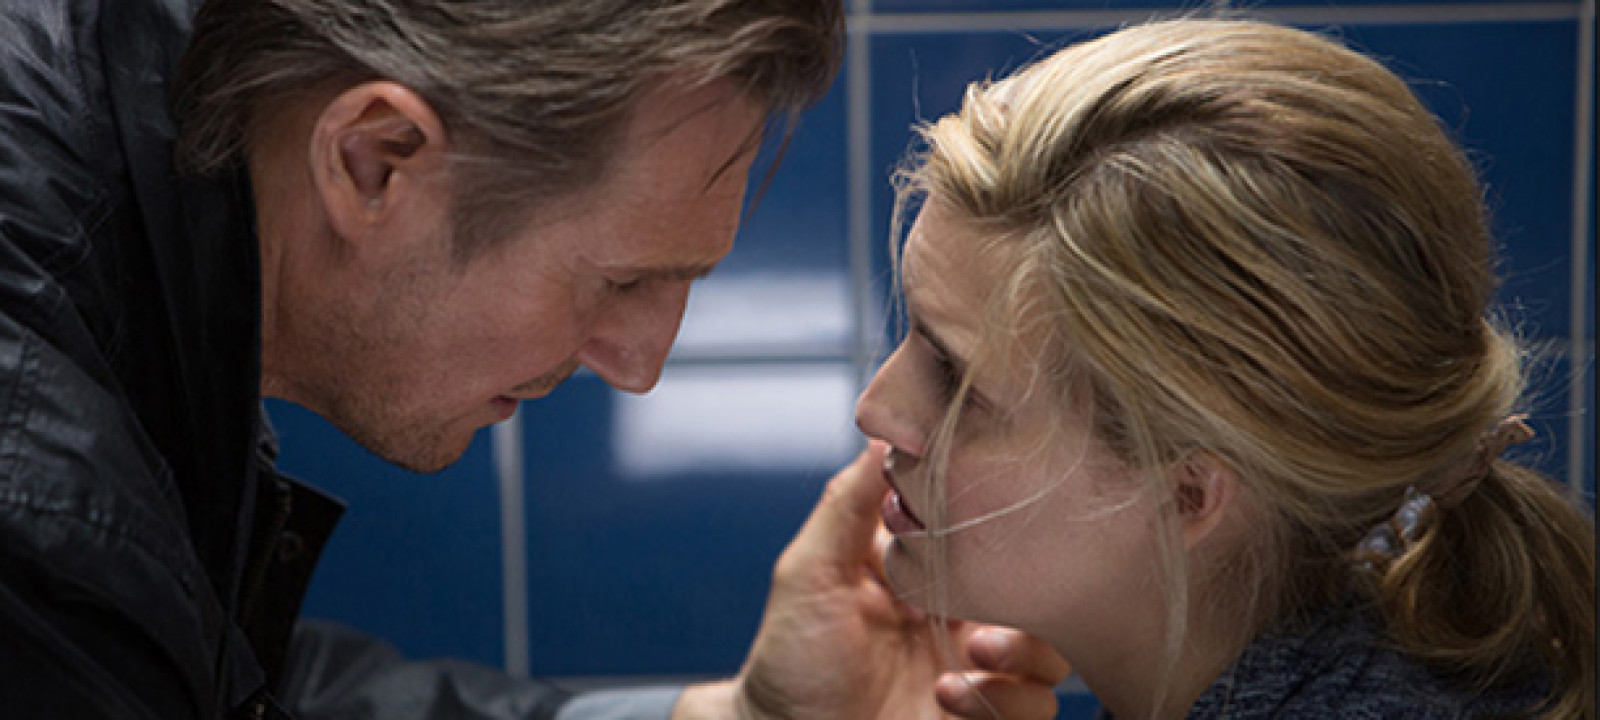 DM-00111 – Liam Neeson and Maggie Grace in TAKEN 3.